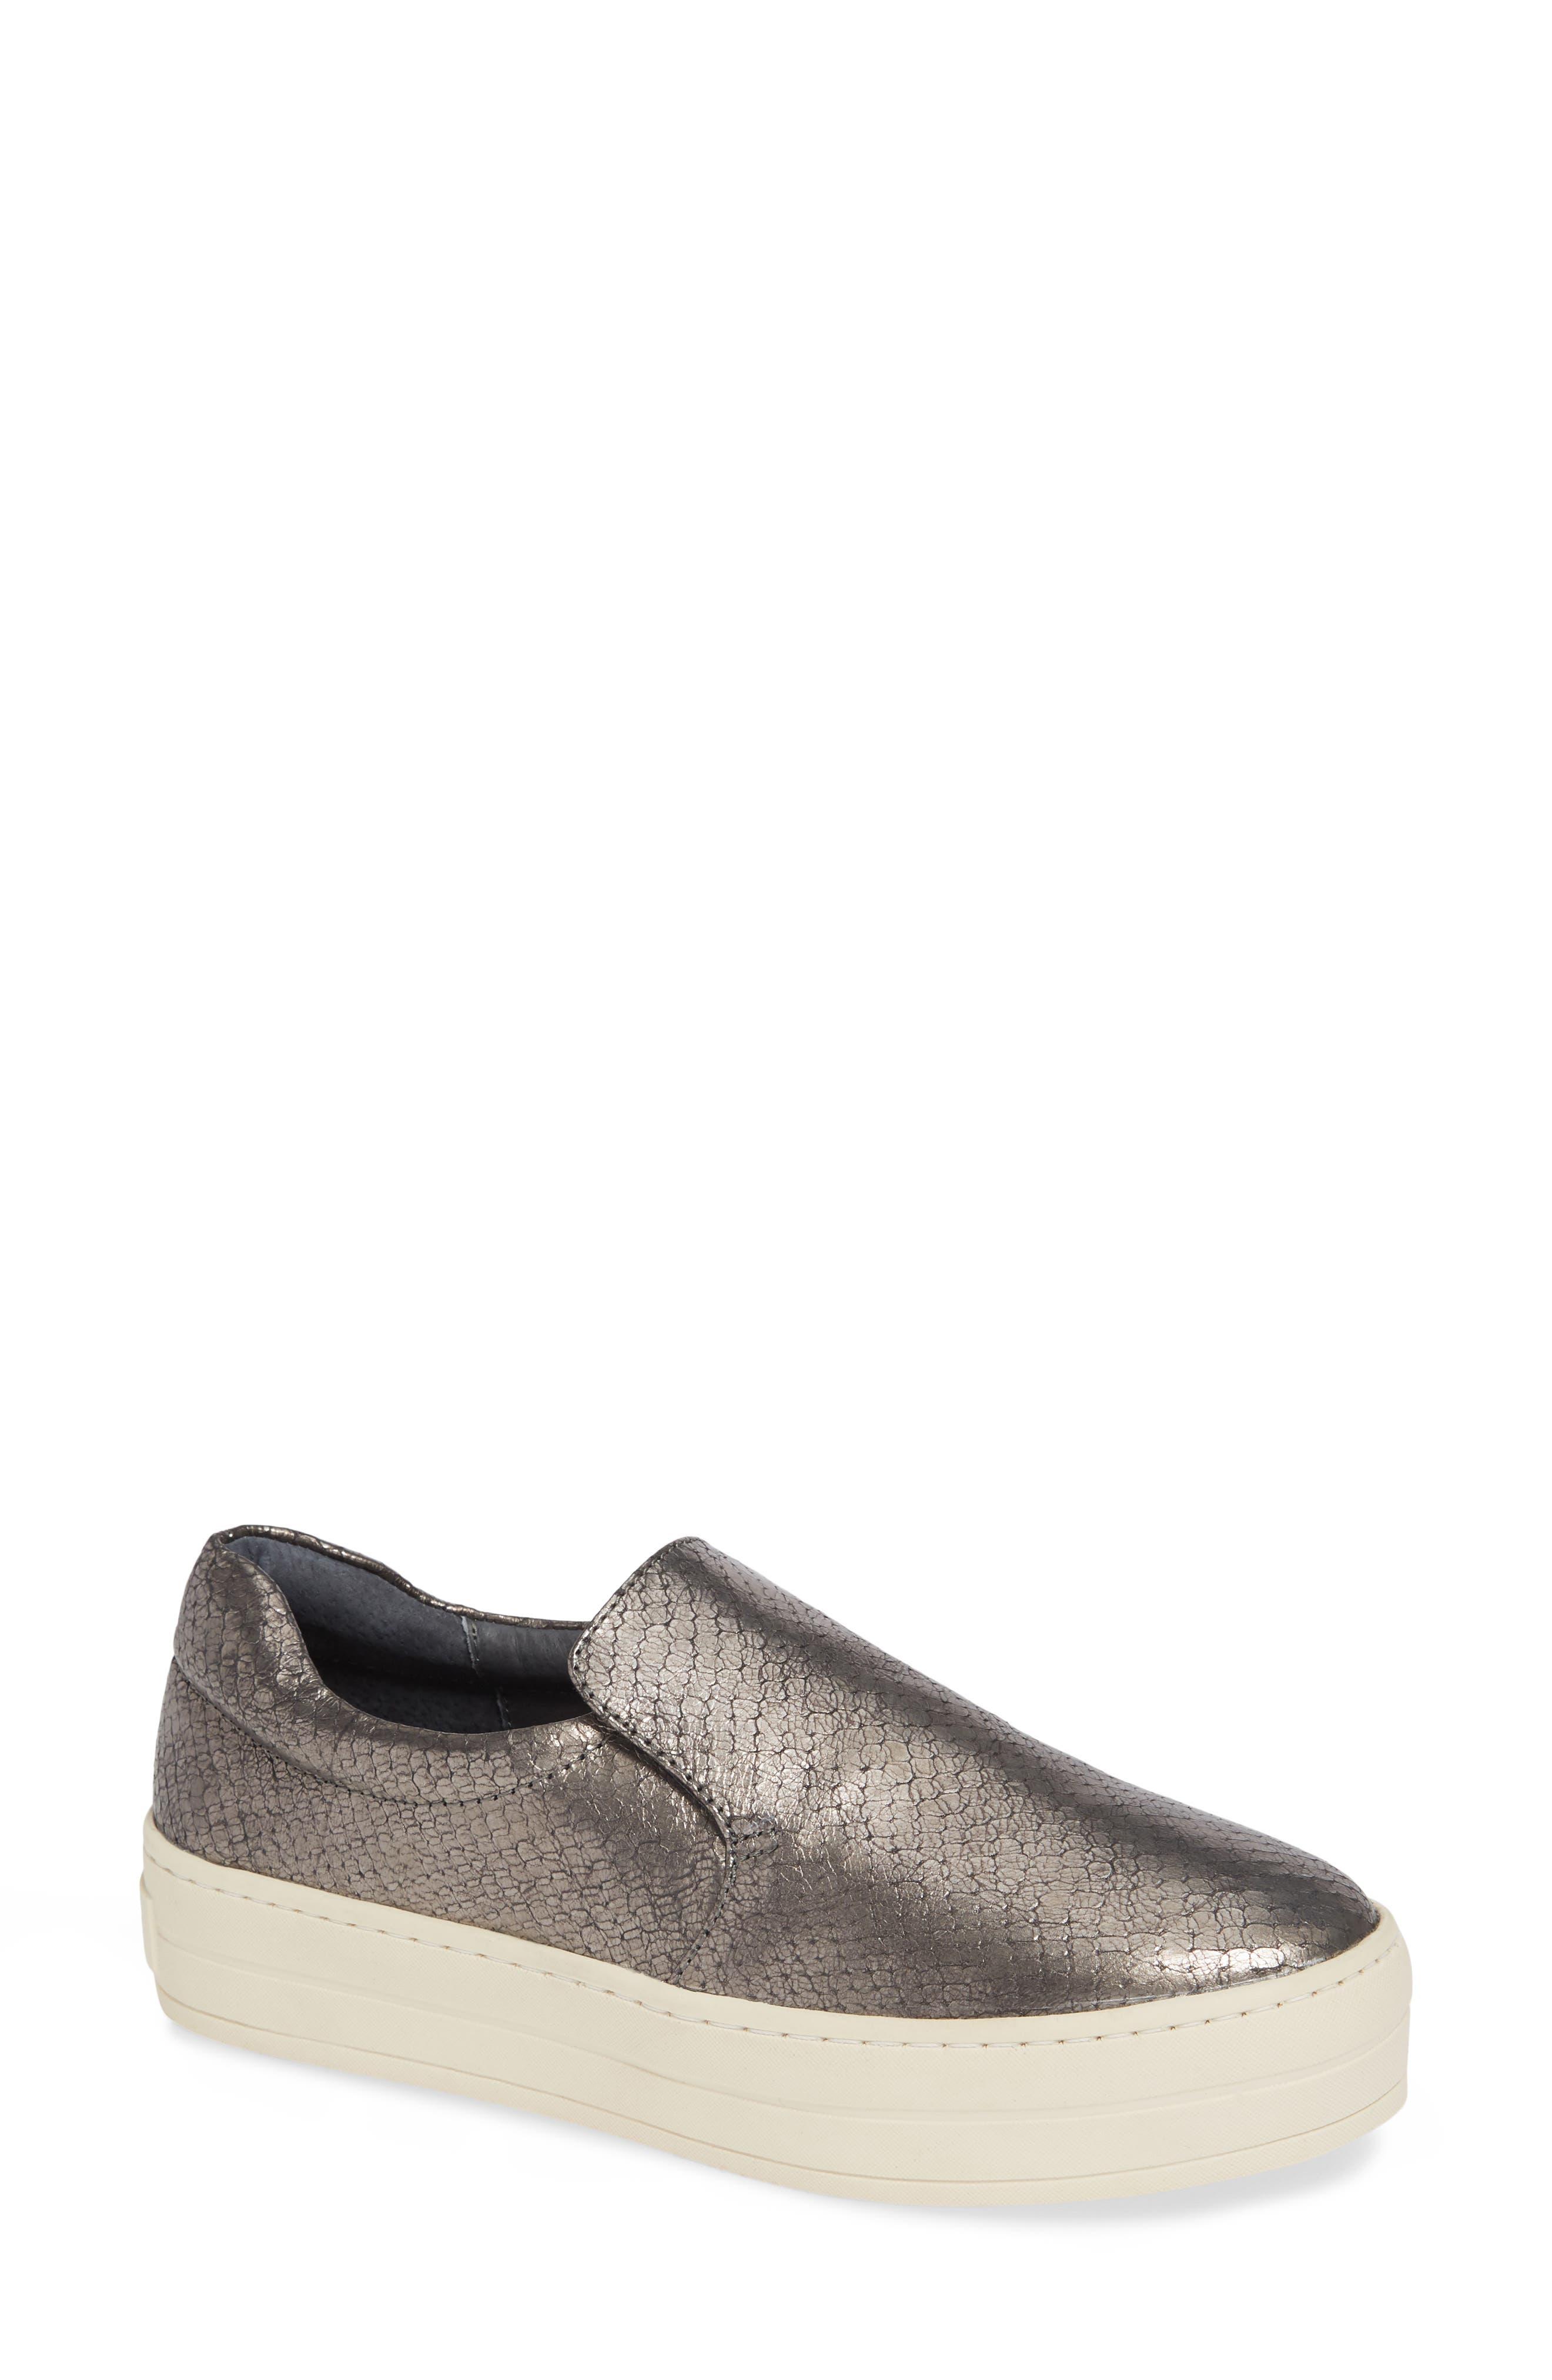 Jslides Harry Slip-On Sneaker, Grey